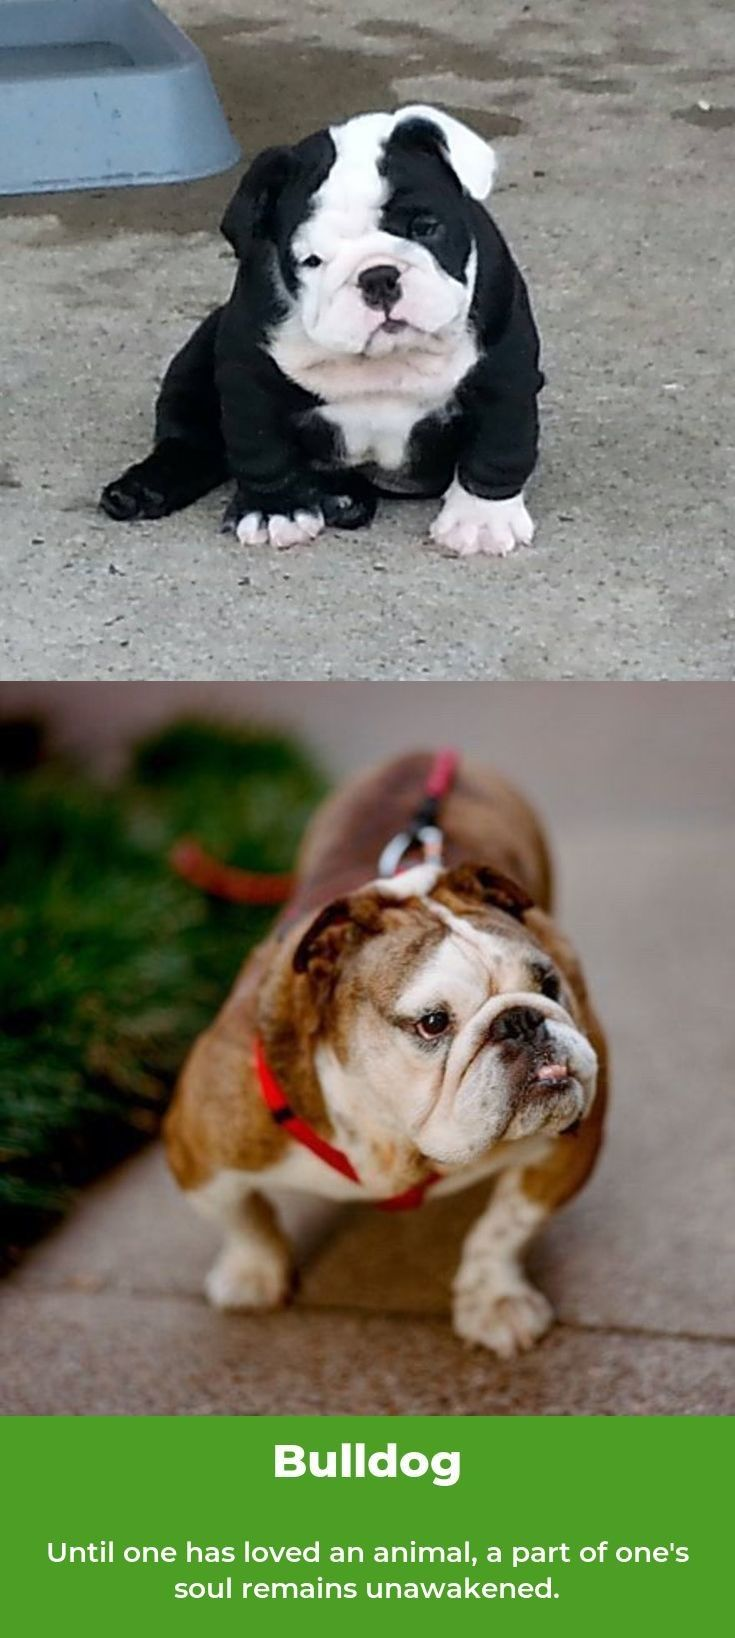 Bulldog bulldogstyle bulldogs (With images) Bulldog